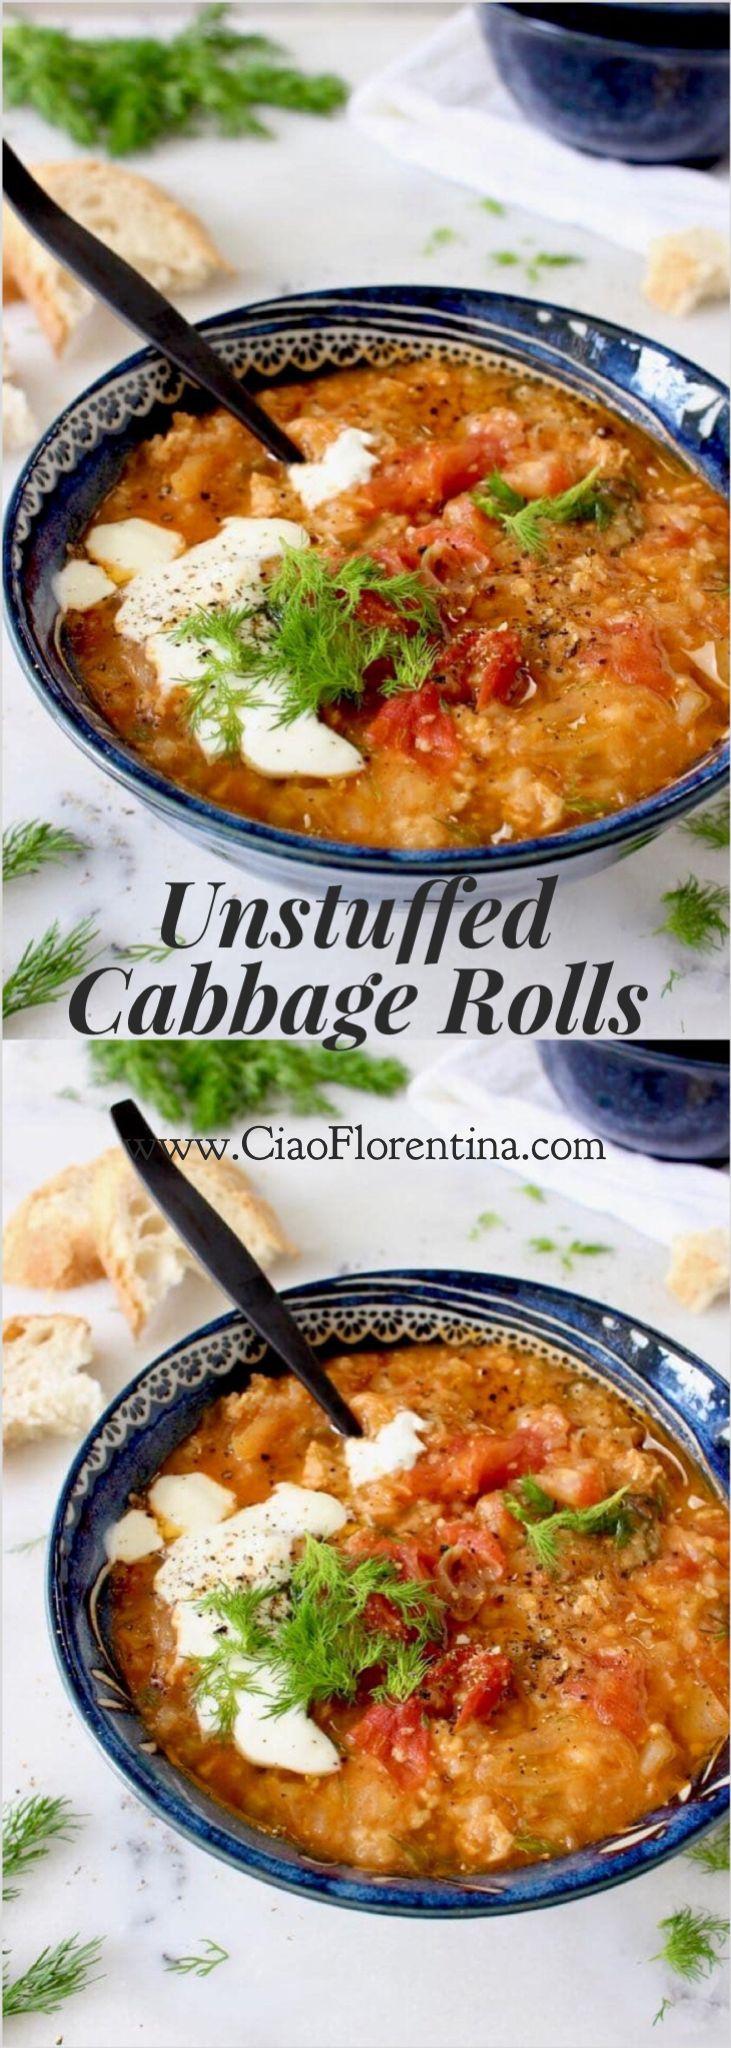 Unstuffed Cabbage Rolls Soup Recipe   CiaoFlorentina.com @CiaoFlorentina